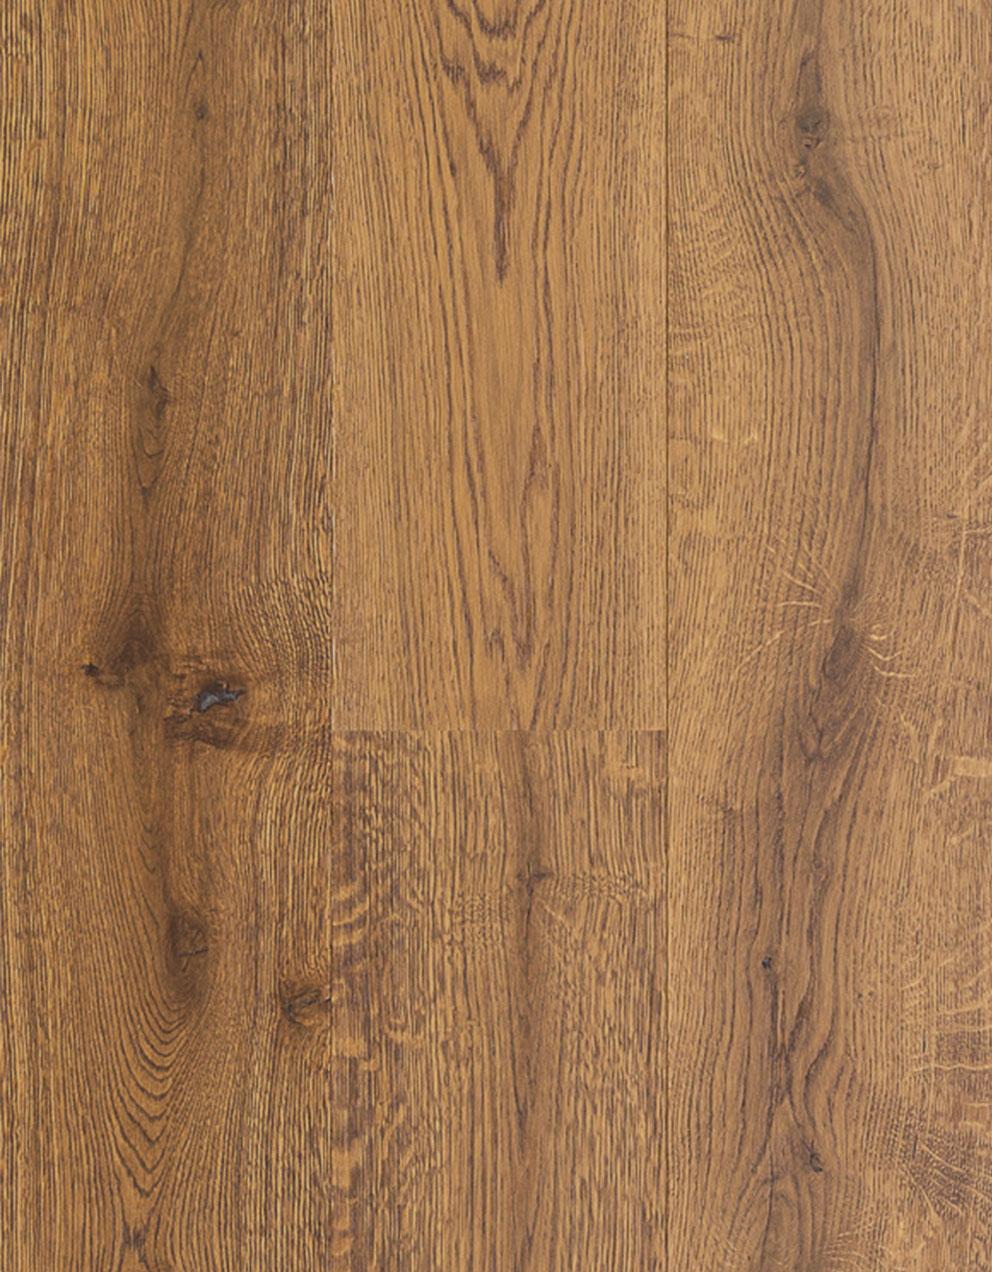 Suelo de madera Roble marrón dorado